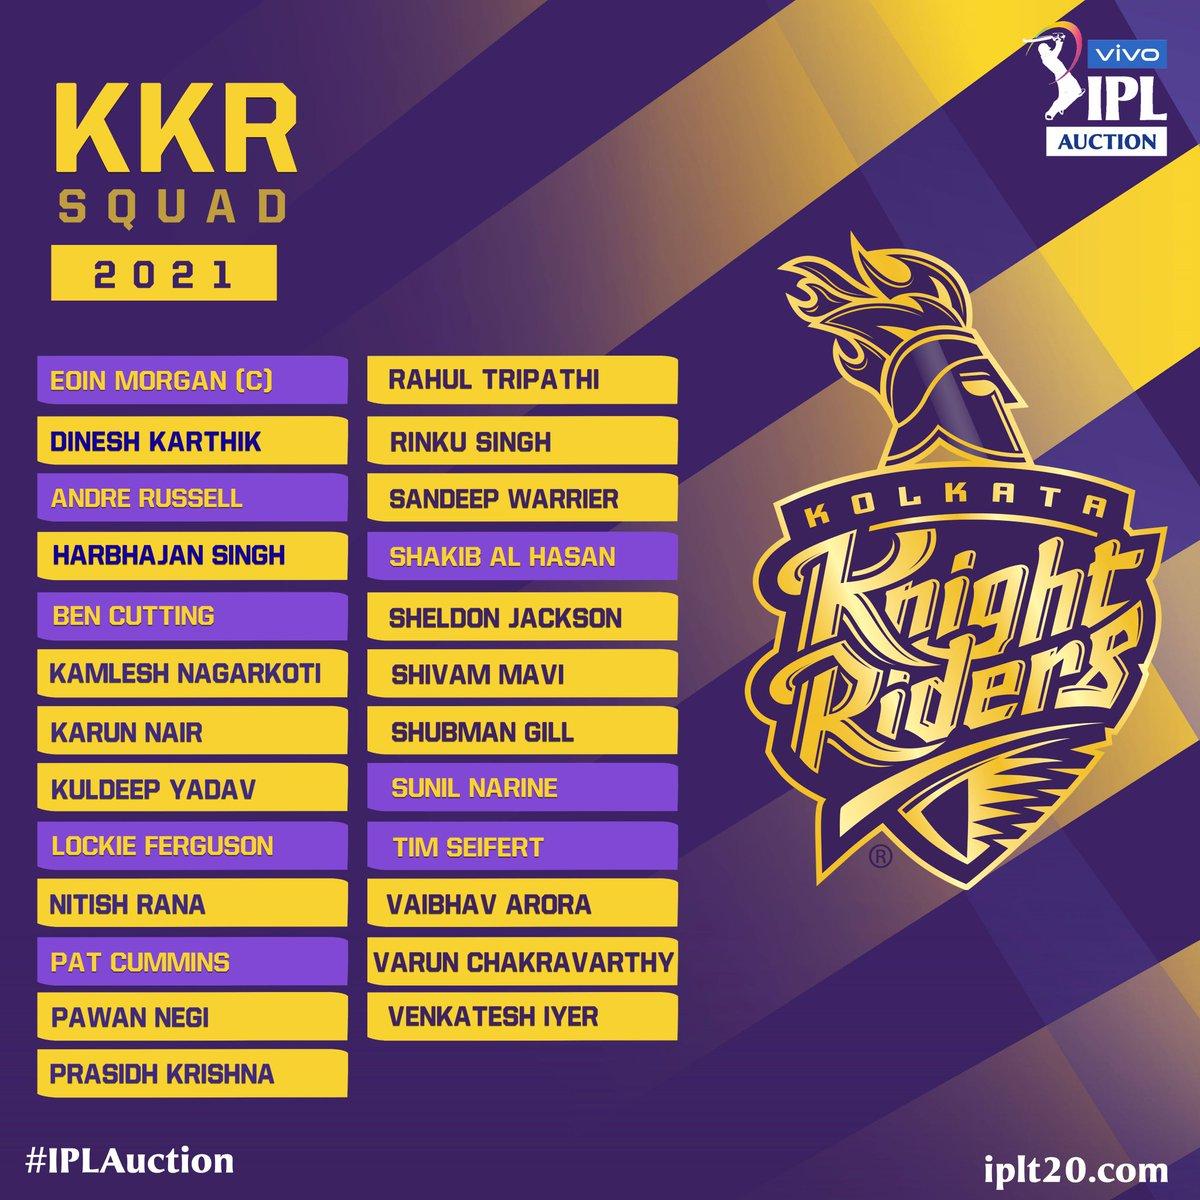 My playing XI for @KKRiders  Gill Tripathi Rana Shakib Morgan Karthik Russell Cummins Chakravarthy Mavi P Krishna  #KolkataKnightRiders #KKR #INDvENG #IPL #IPL2021 #Ahmedabad #axarpatel #smat2021 #VHTrophy #VijayHazareTrophy2021 #VijayHazareTrophy